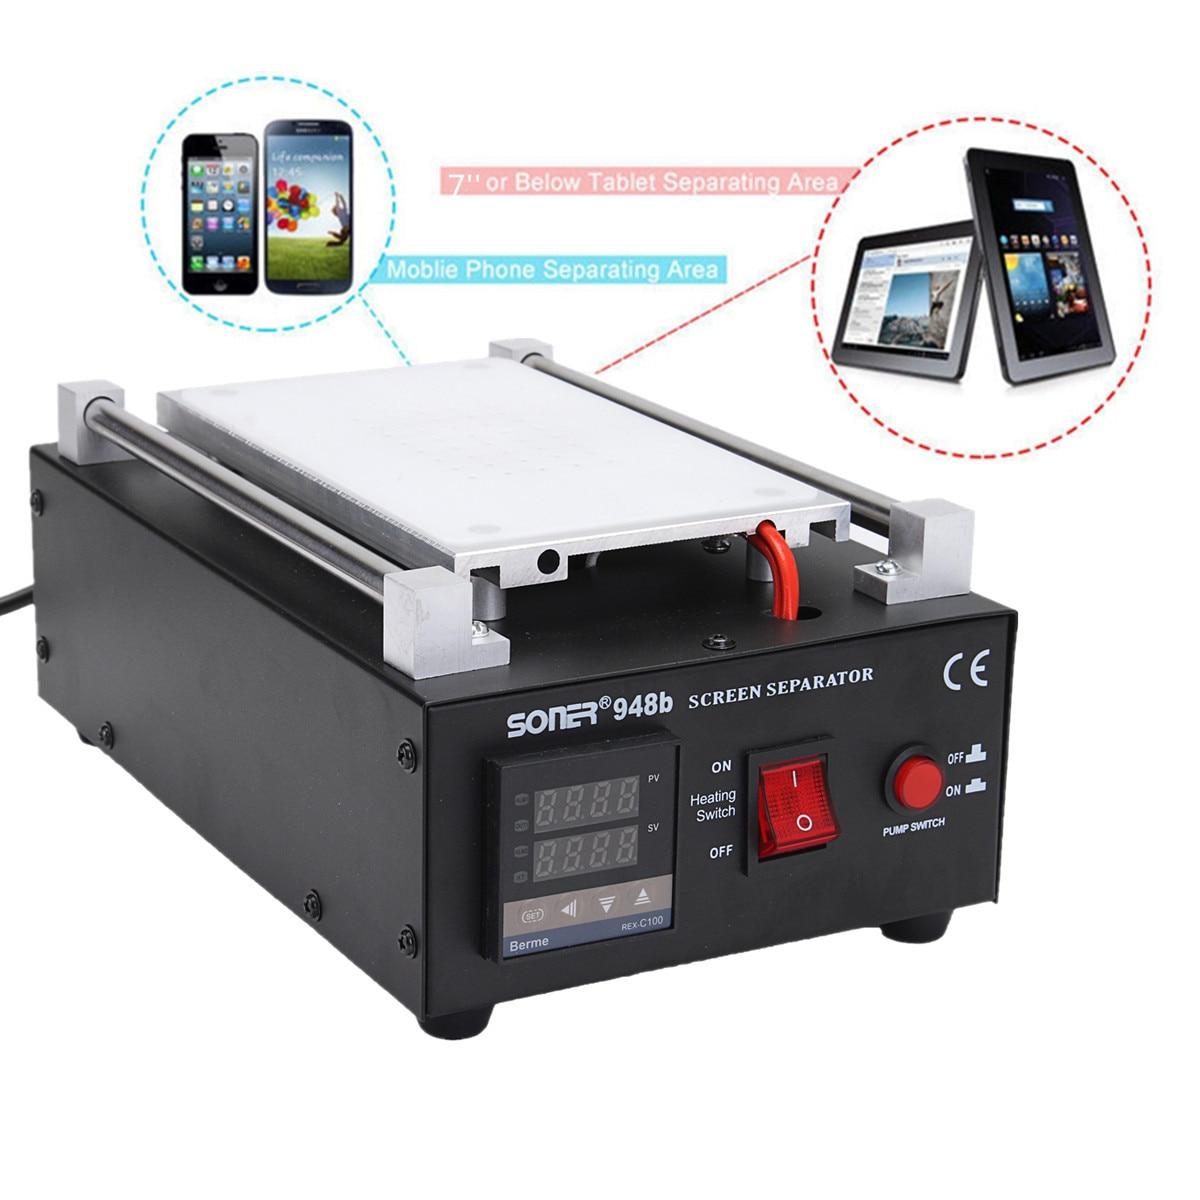 все цены на LCD Glass Screen Separator Repair Machine 7 Built-in Vacuum Pump Mobile Phone Different Cover Plate Auto Heating LED Display онлайн